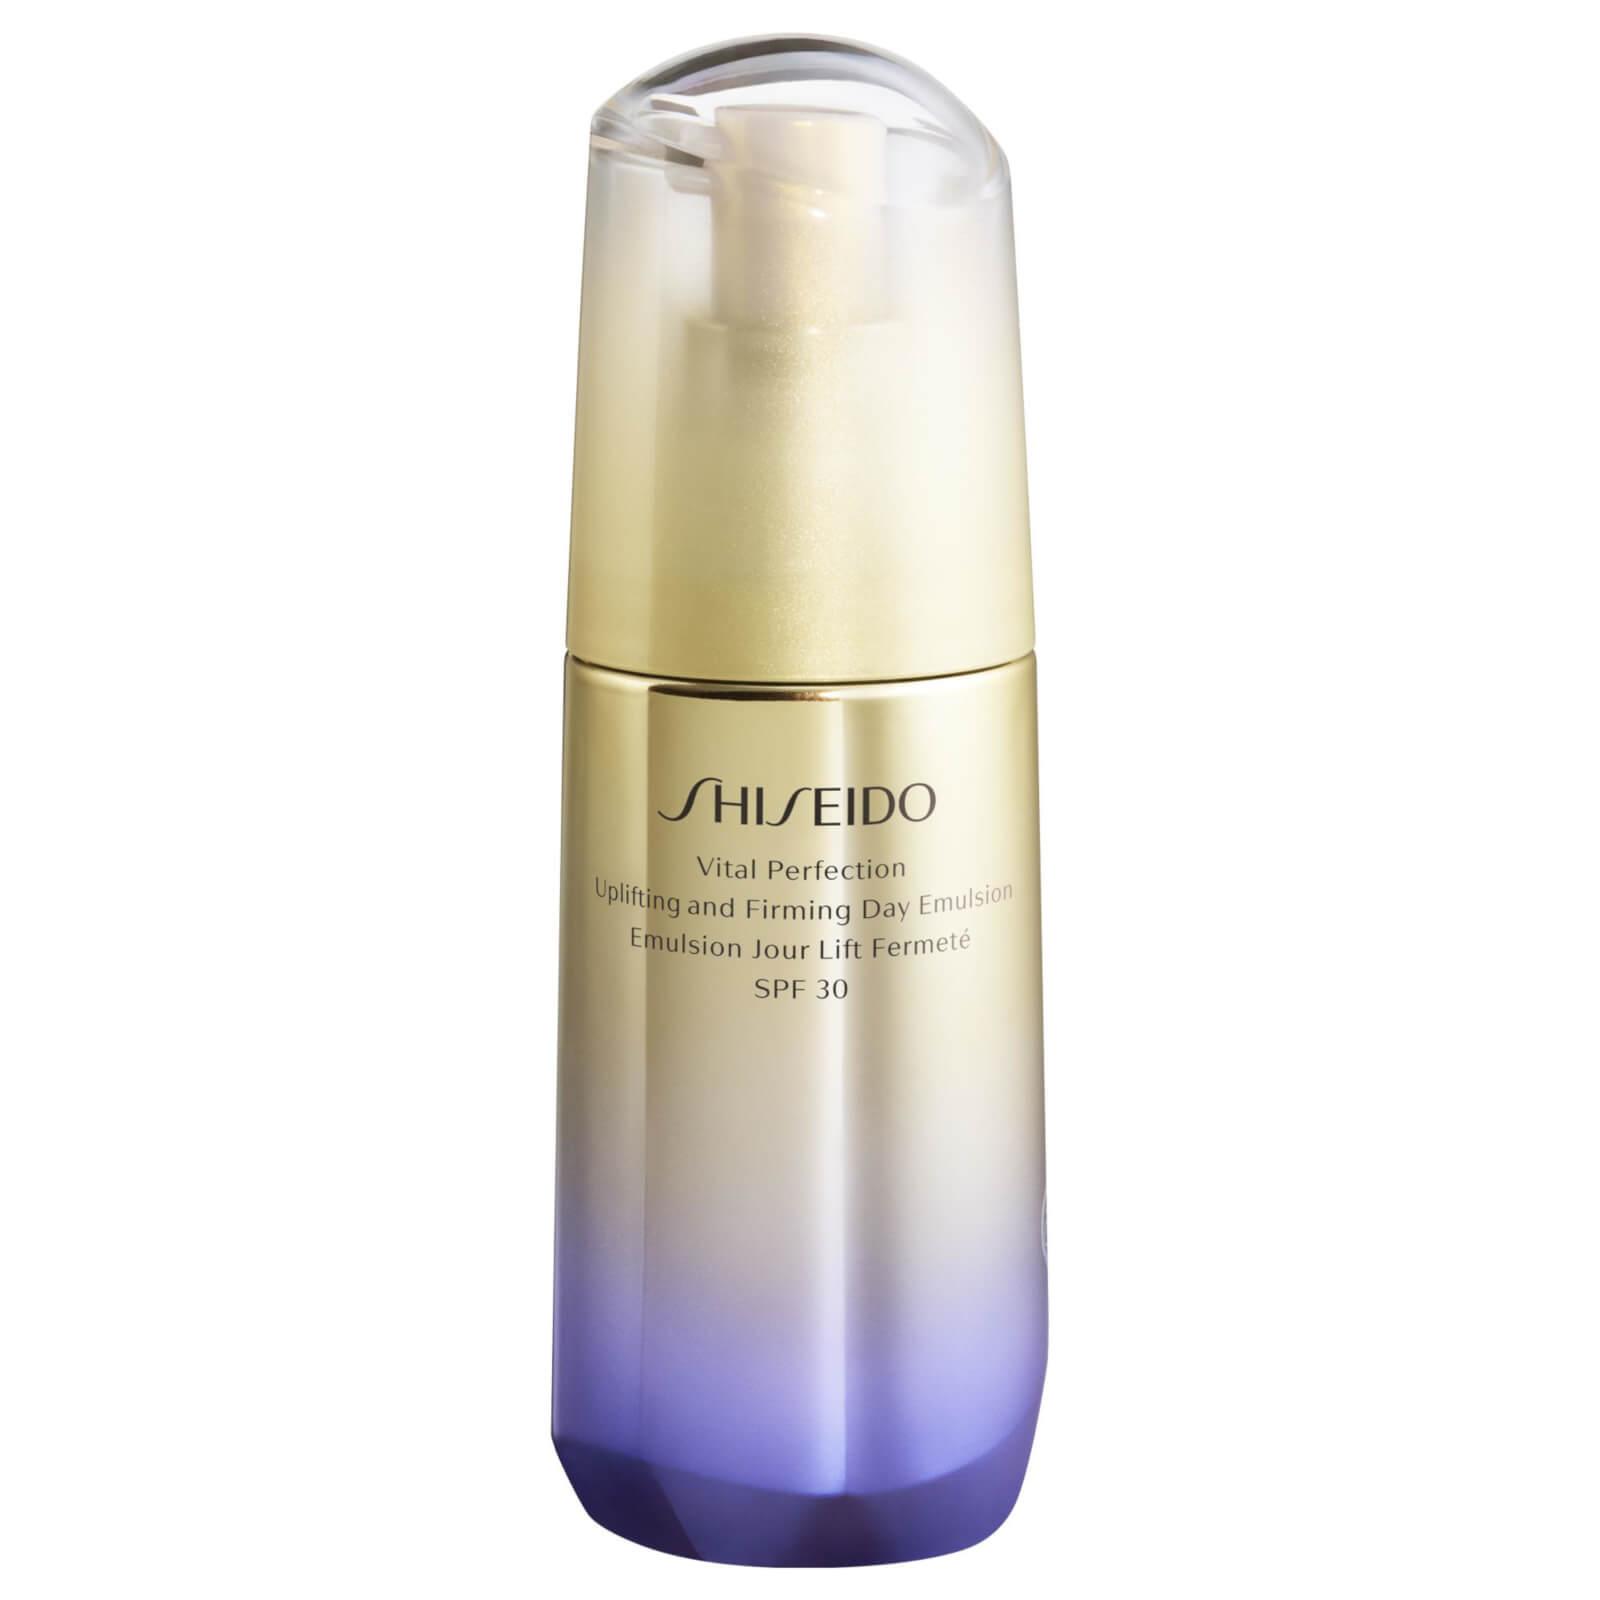 Купить Shiseido Vital Perfection Uplifting and Firming Day Emulsion SPF30